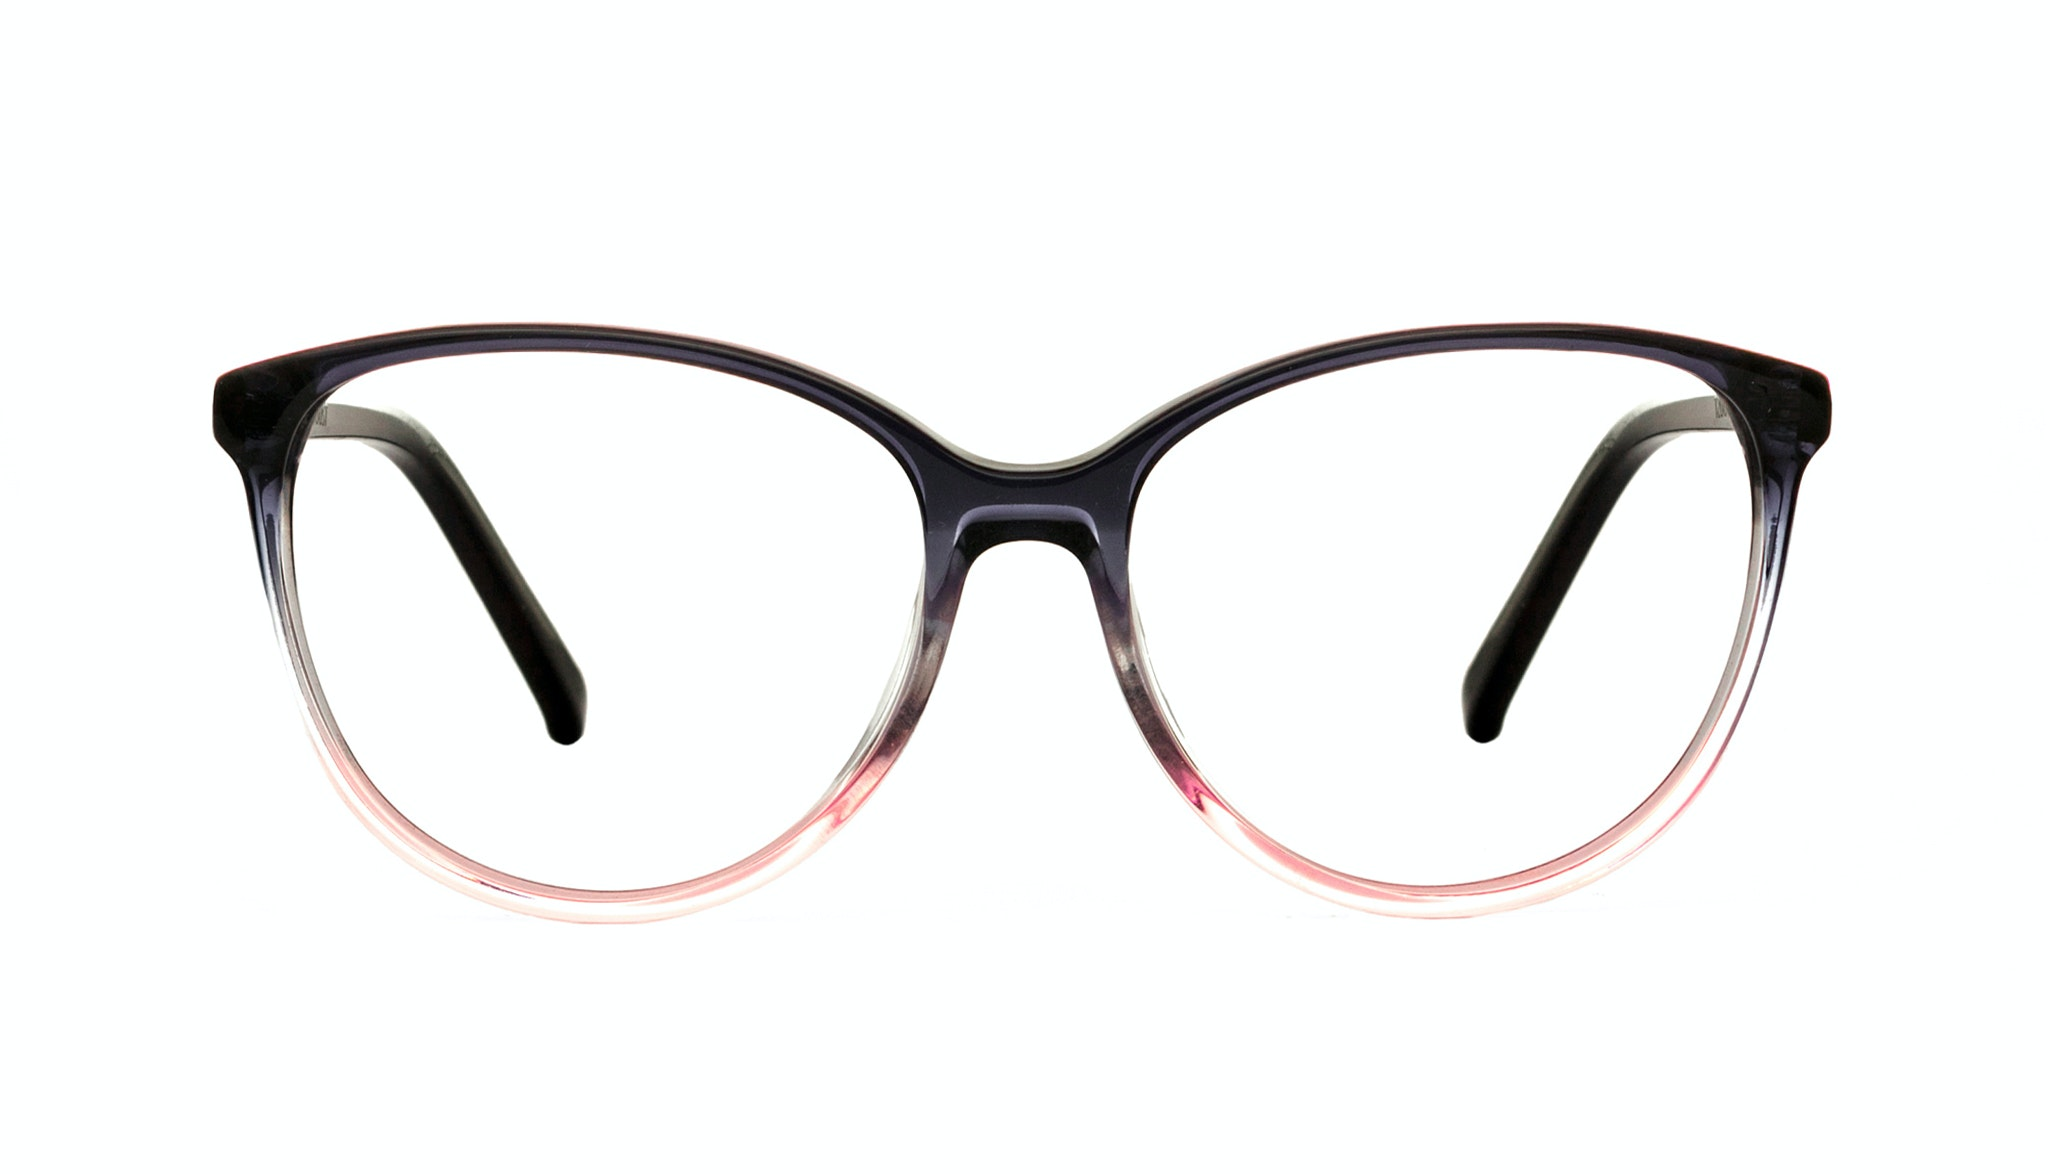 Affordable Fashion Glasses Cat Eye Round Eyeglasses Women Imagine Pink Dust Front